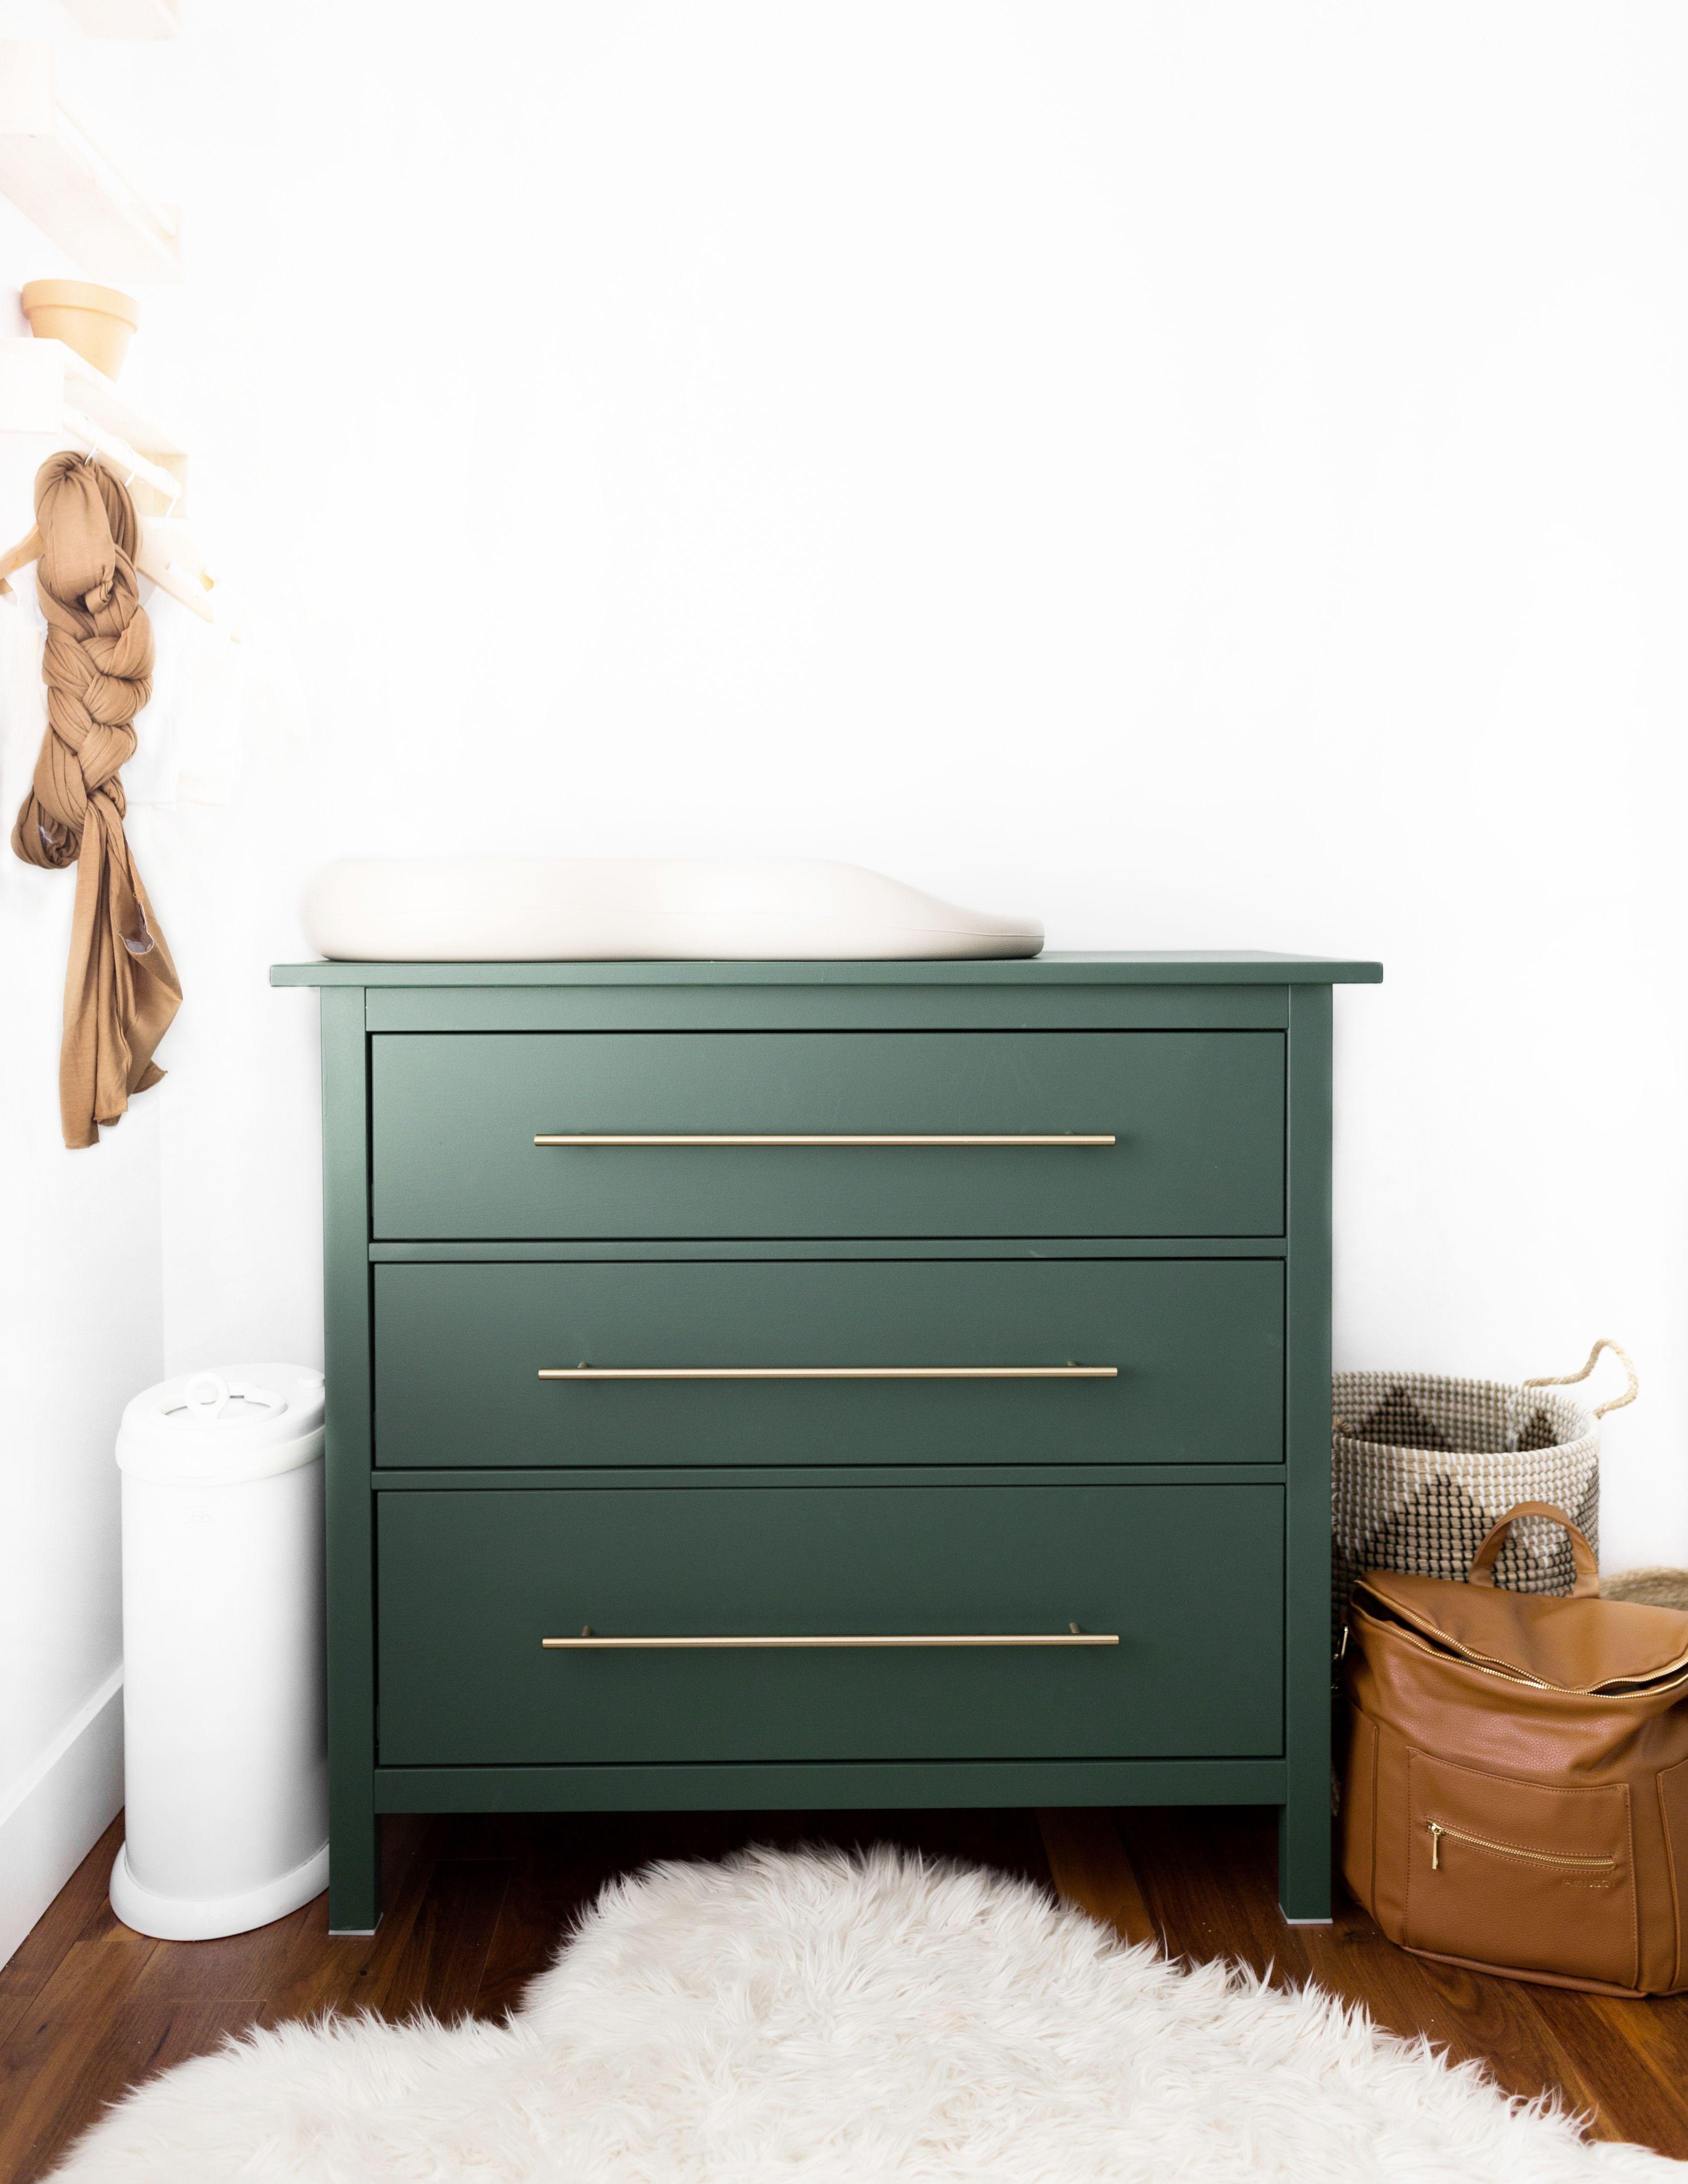 Cassettiera Ikea Malm Usata.Ikea 3 Drawer Hemnes Hack Modern Boho Scandinavian Nursery